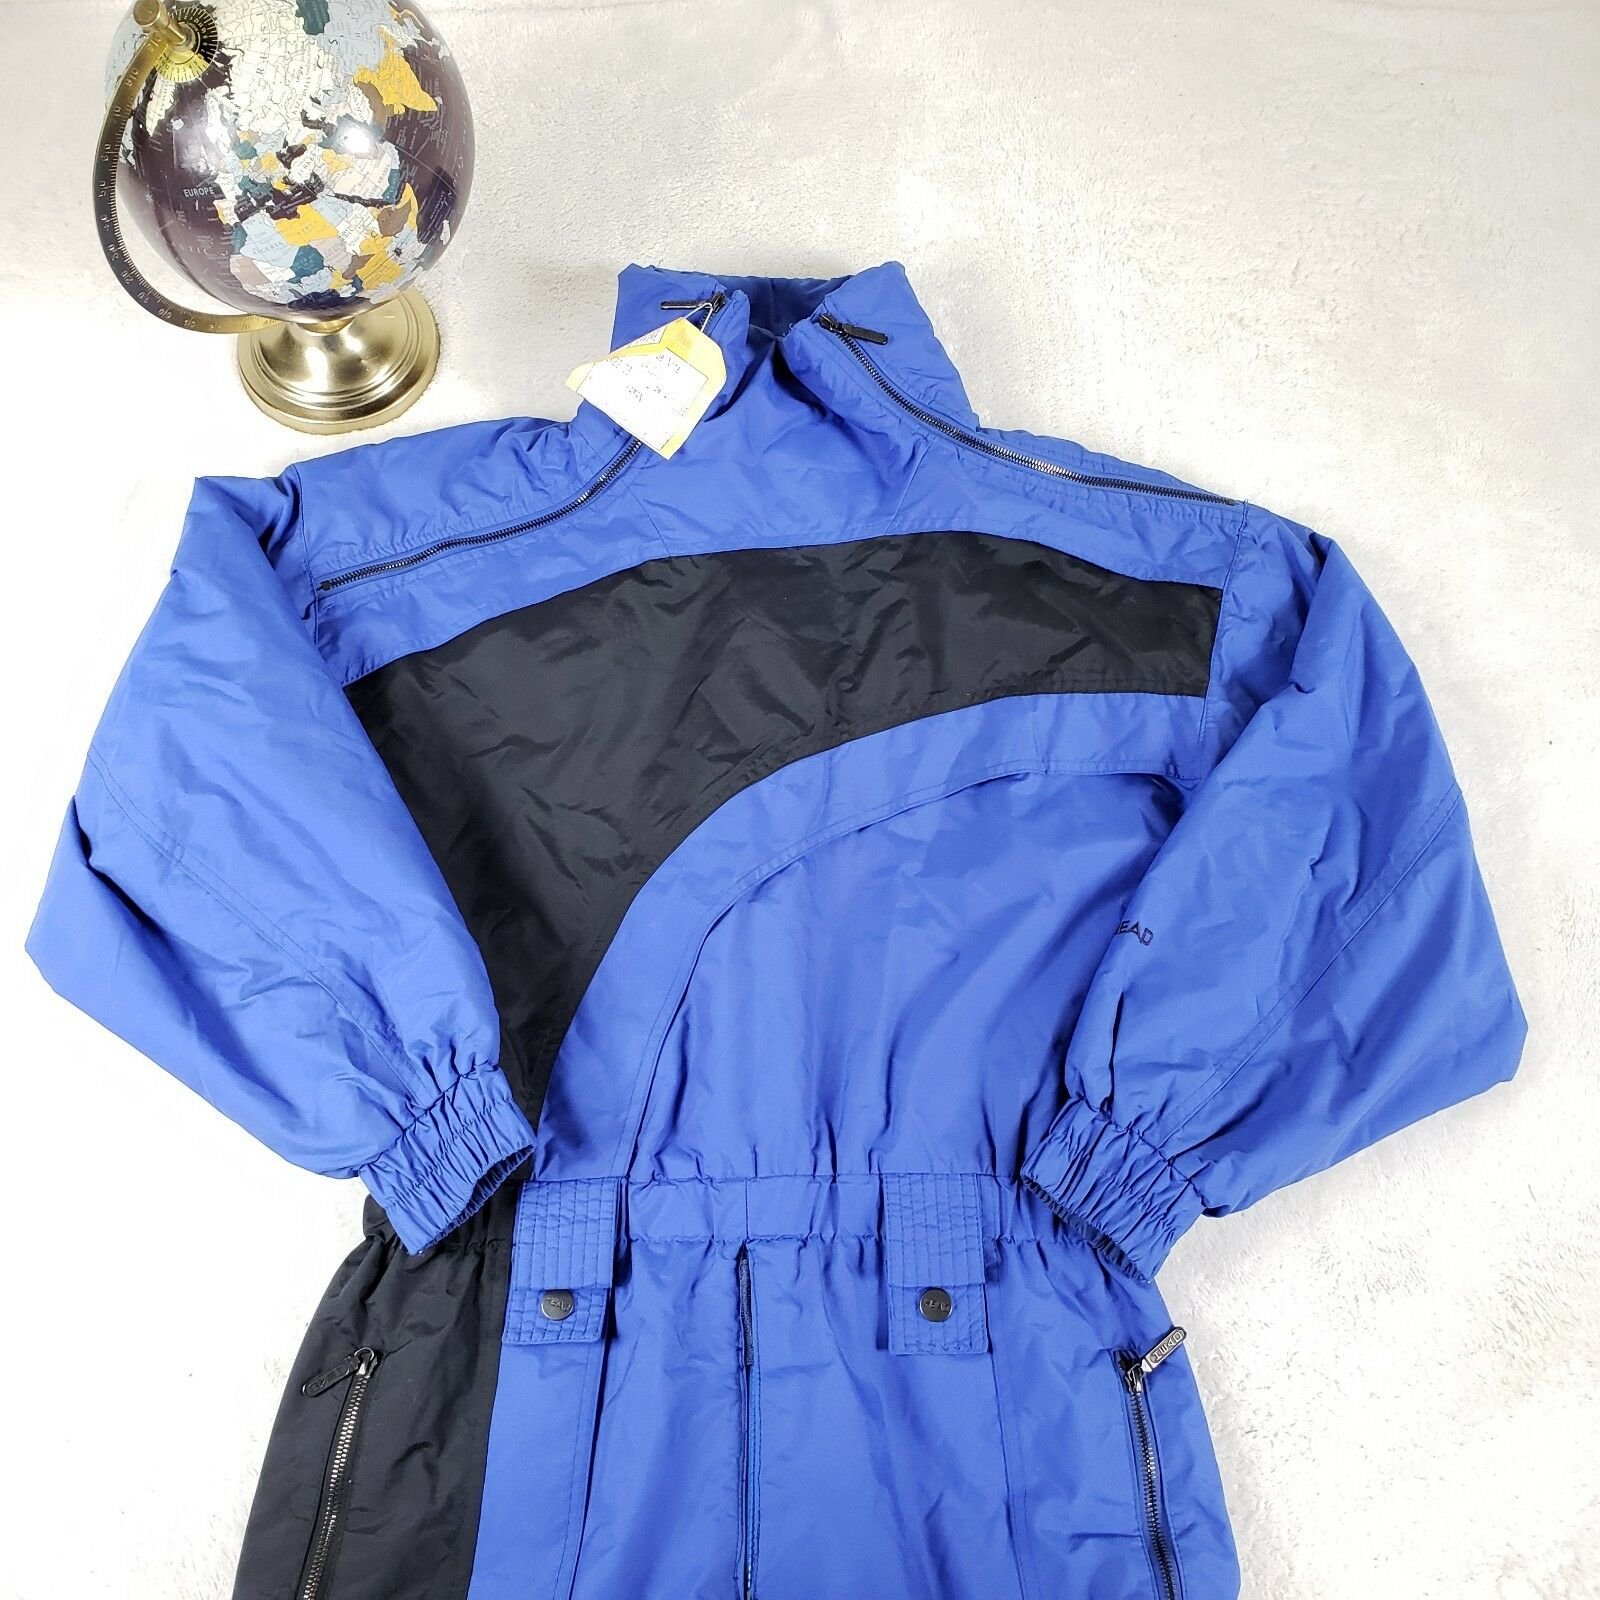 VTG 80s  HEAD One piece Ski Snow Suit Bib O lls bluee Sz Medium  online shopping